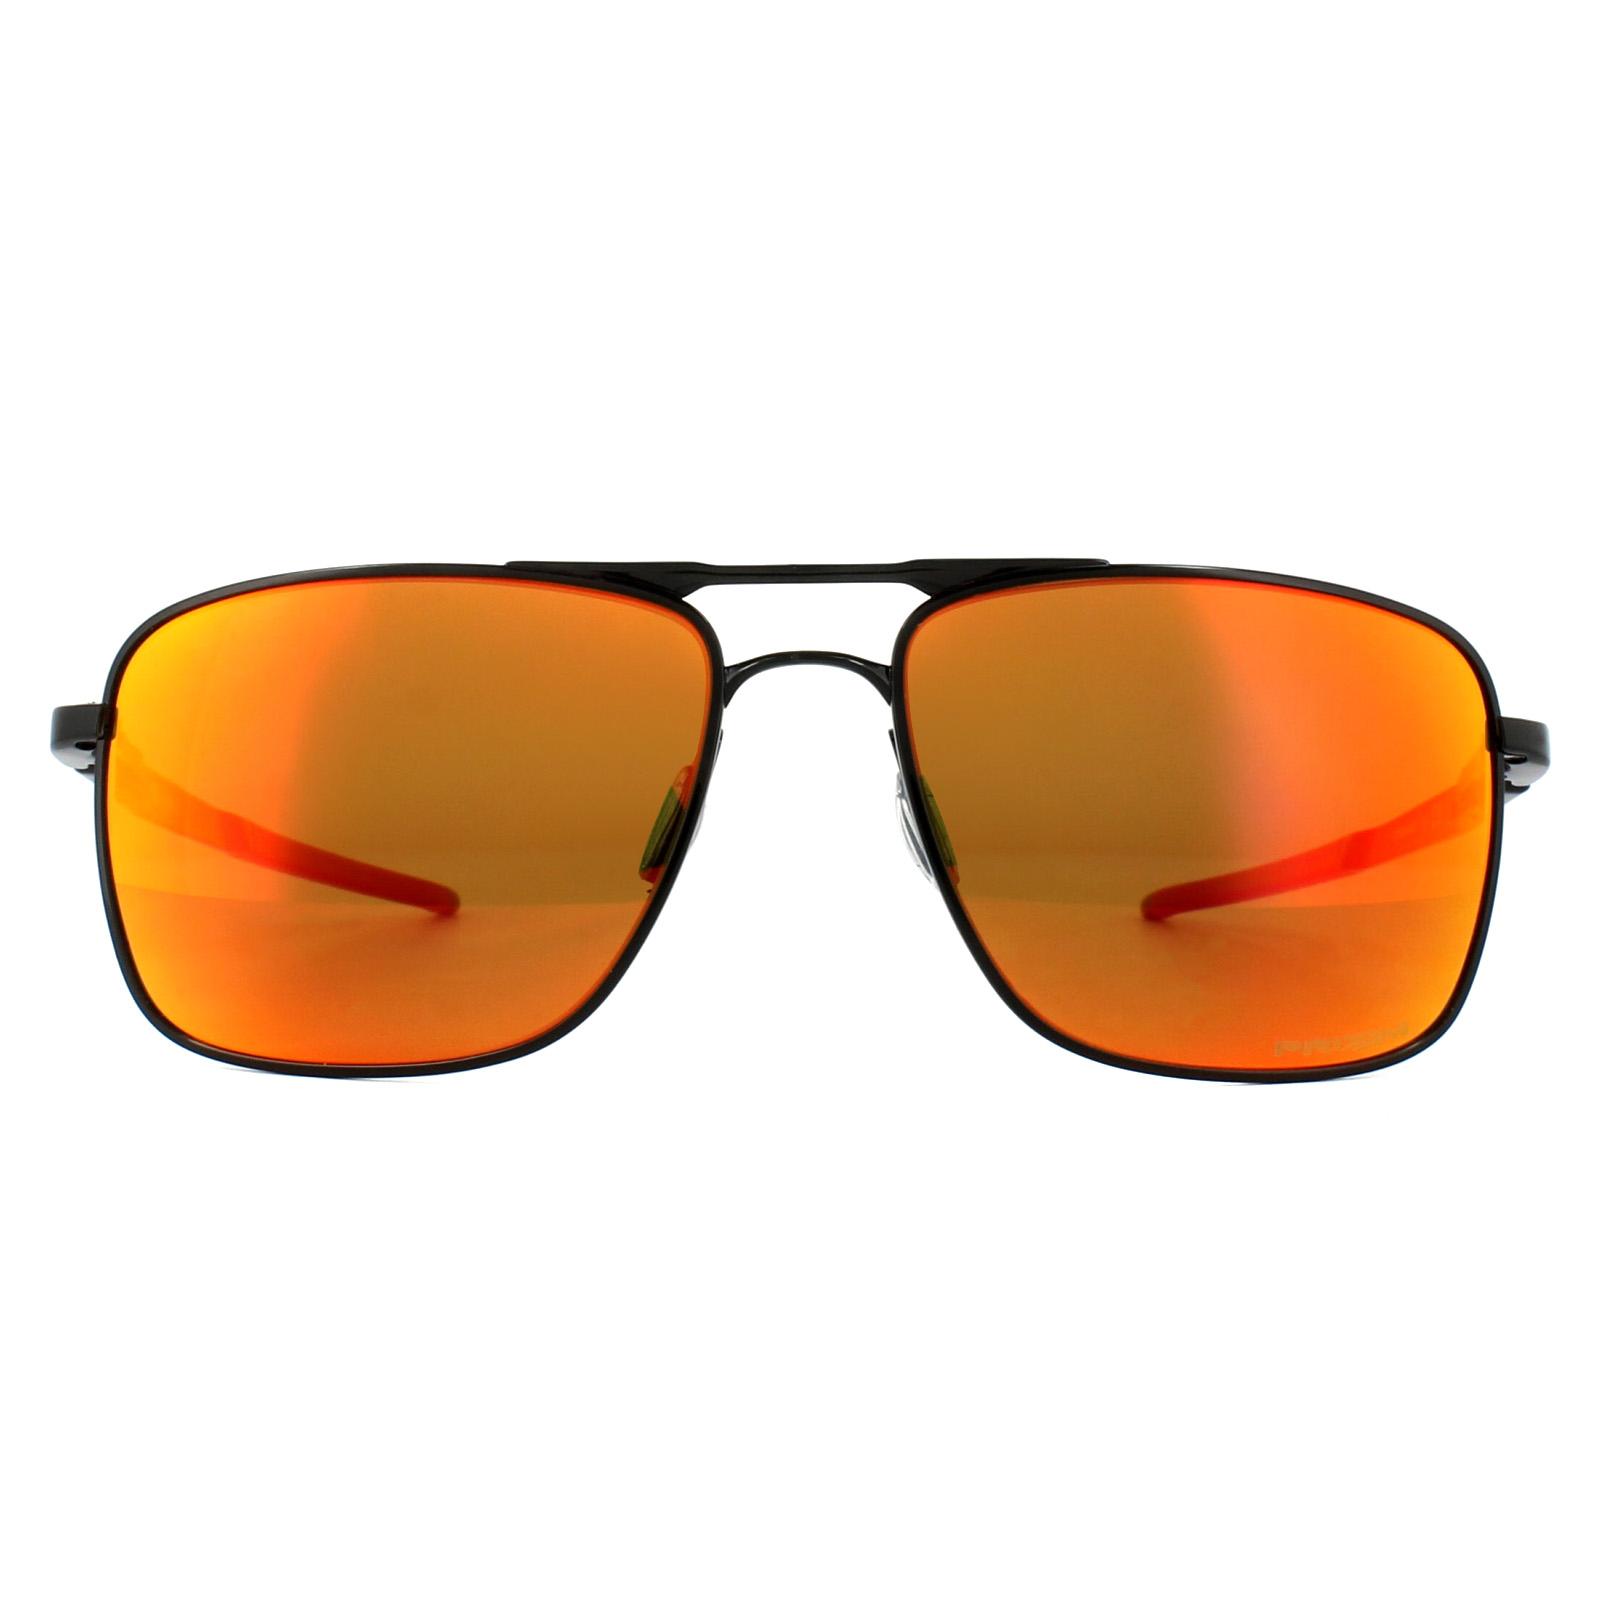 dc8c66a87c Sentinel Oakley Sunglasses Gauge 6 OO6038-04 Polished Black Prizm Ruby  Polarized